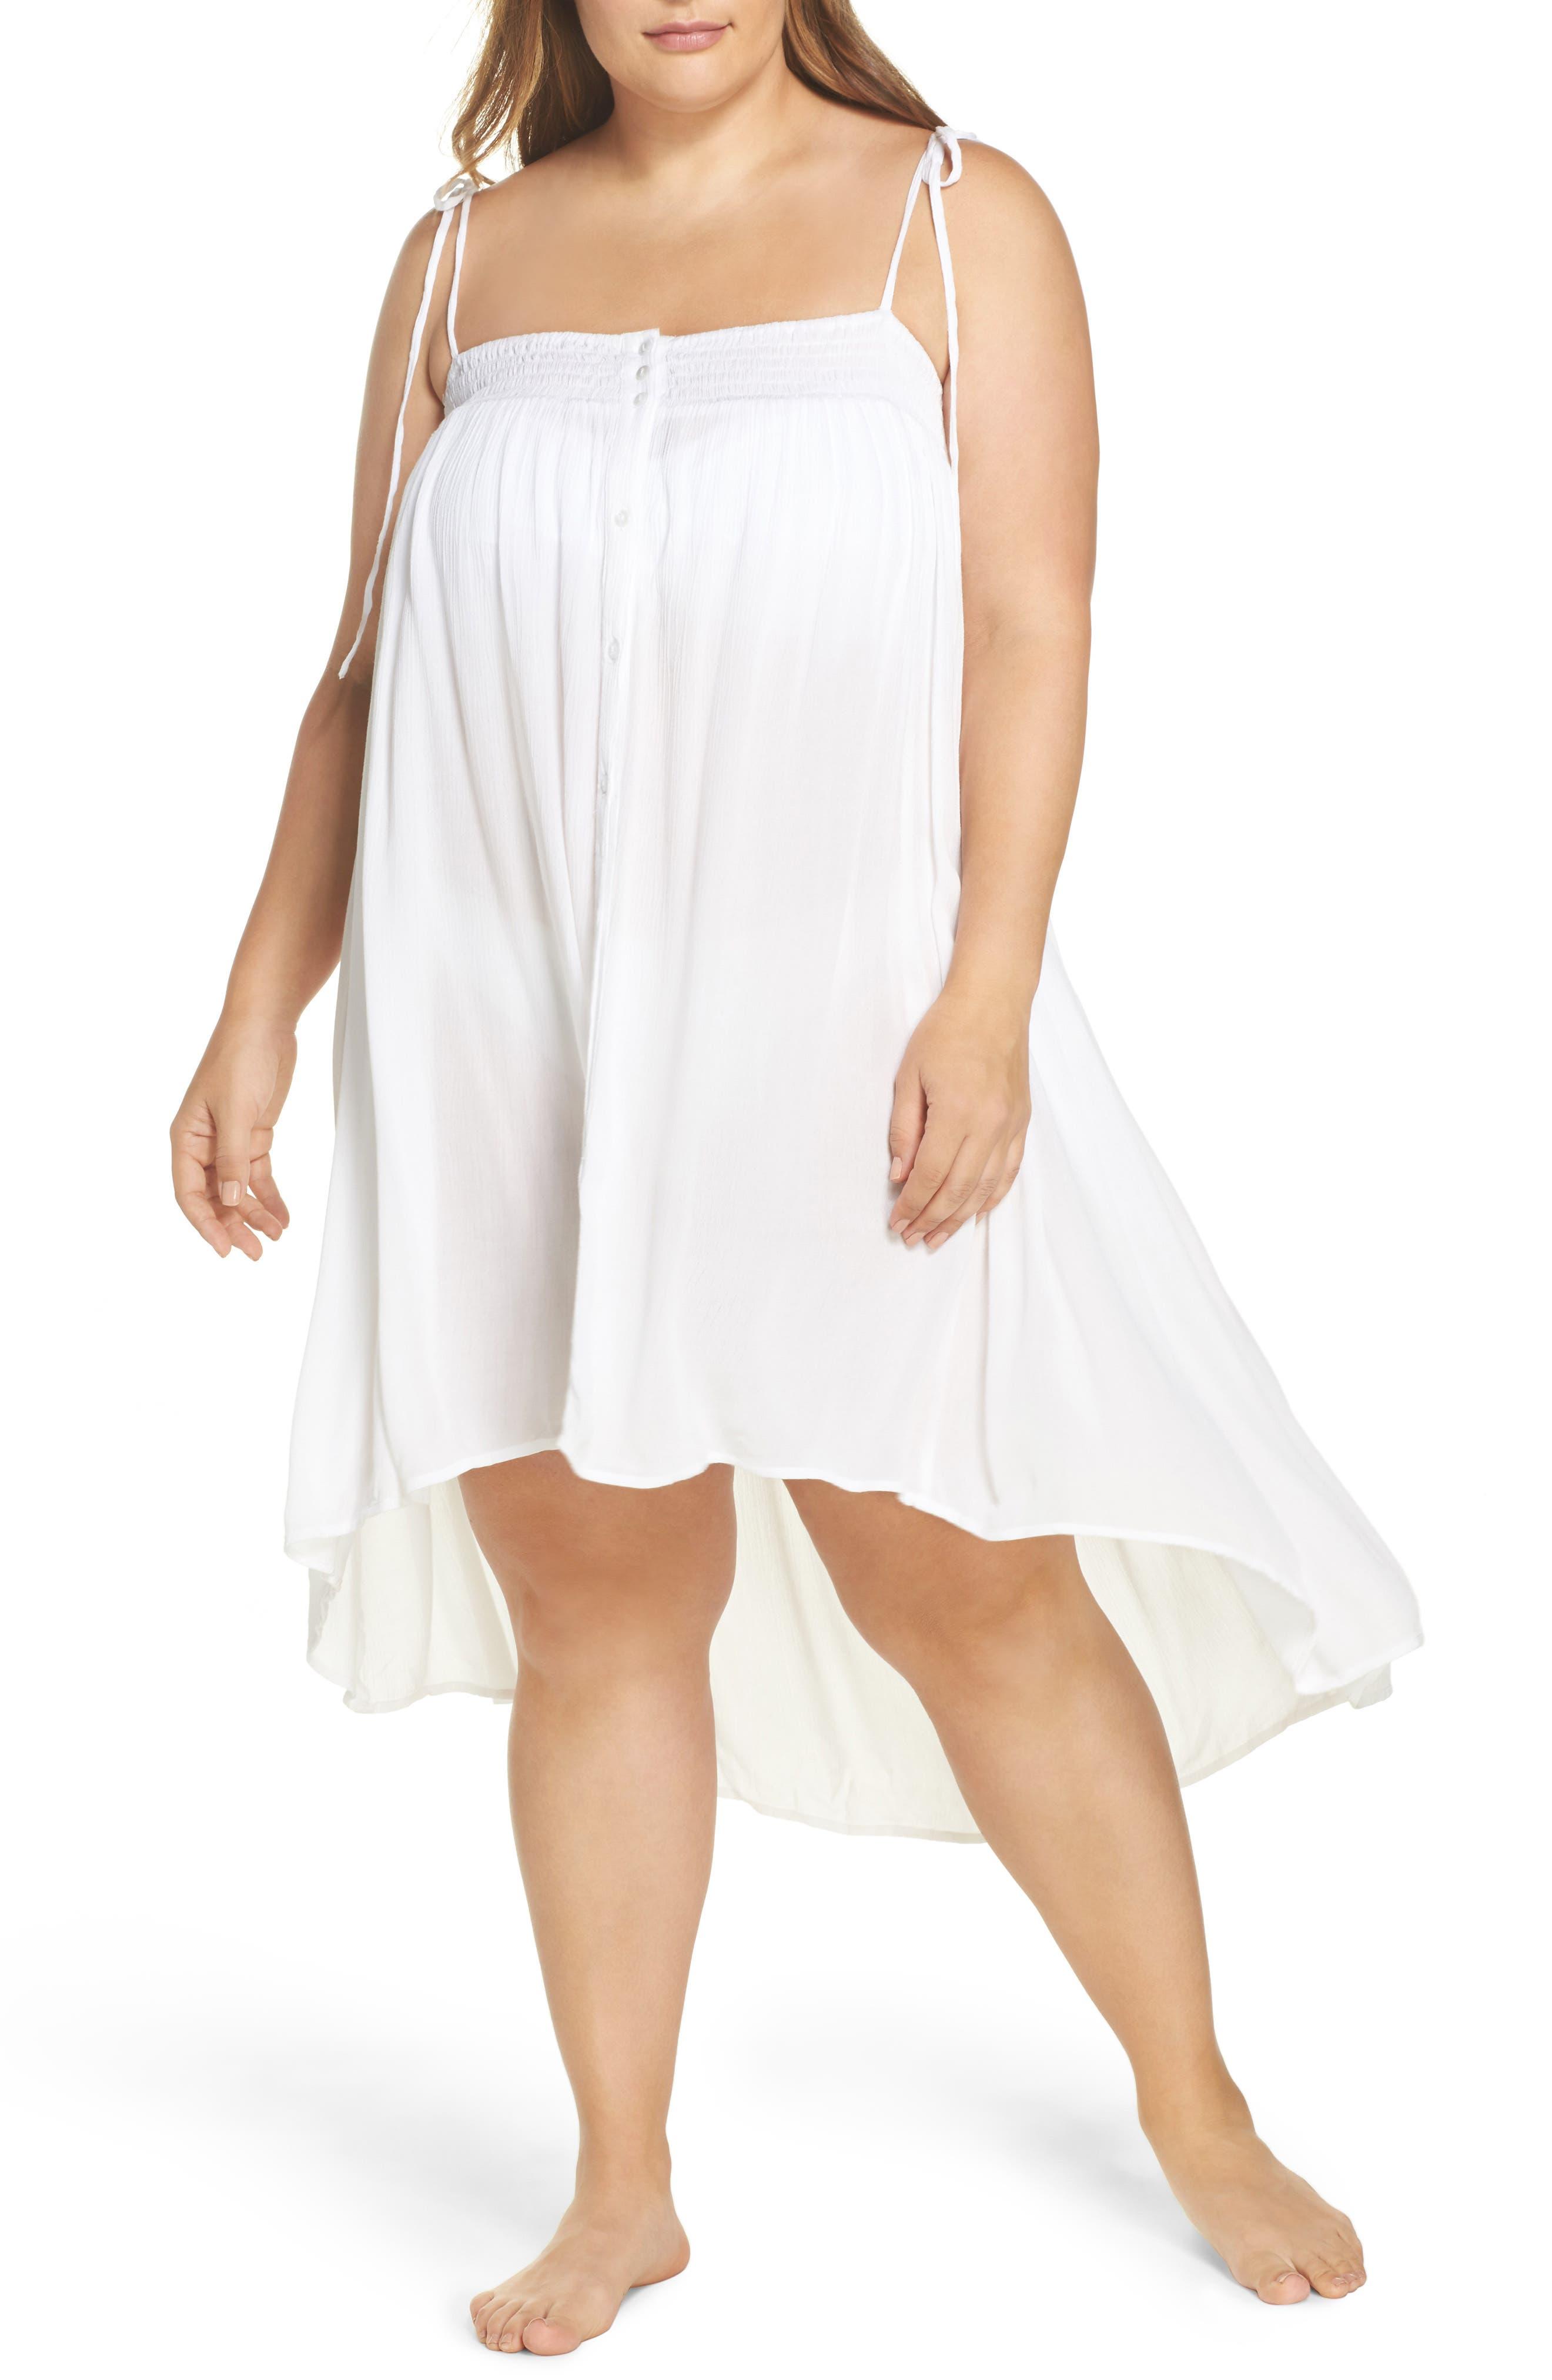 Oliva Cover-Up Dress,                             Main thumbnail 1, color,                             100